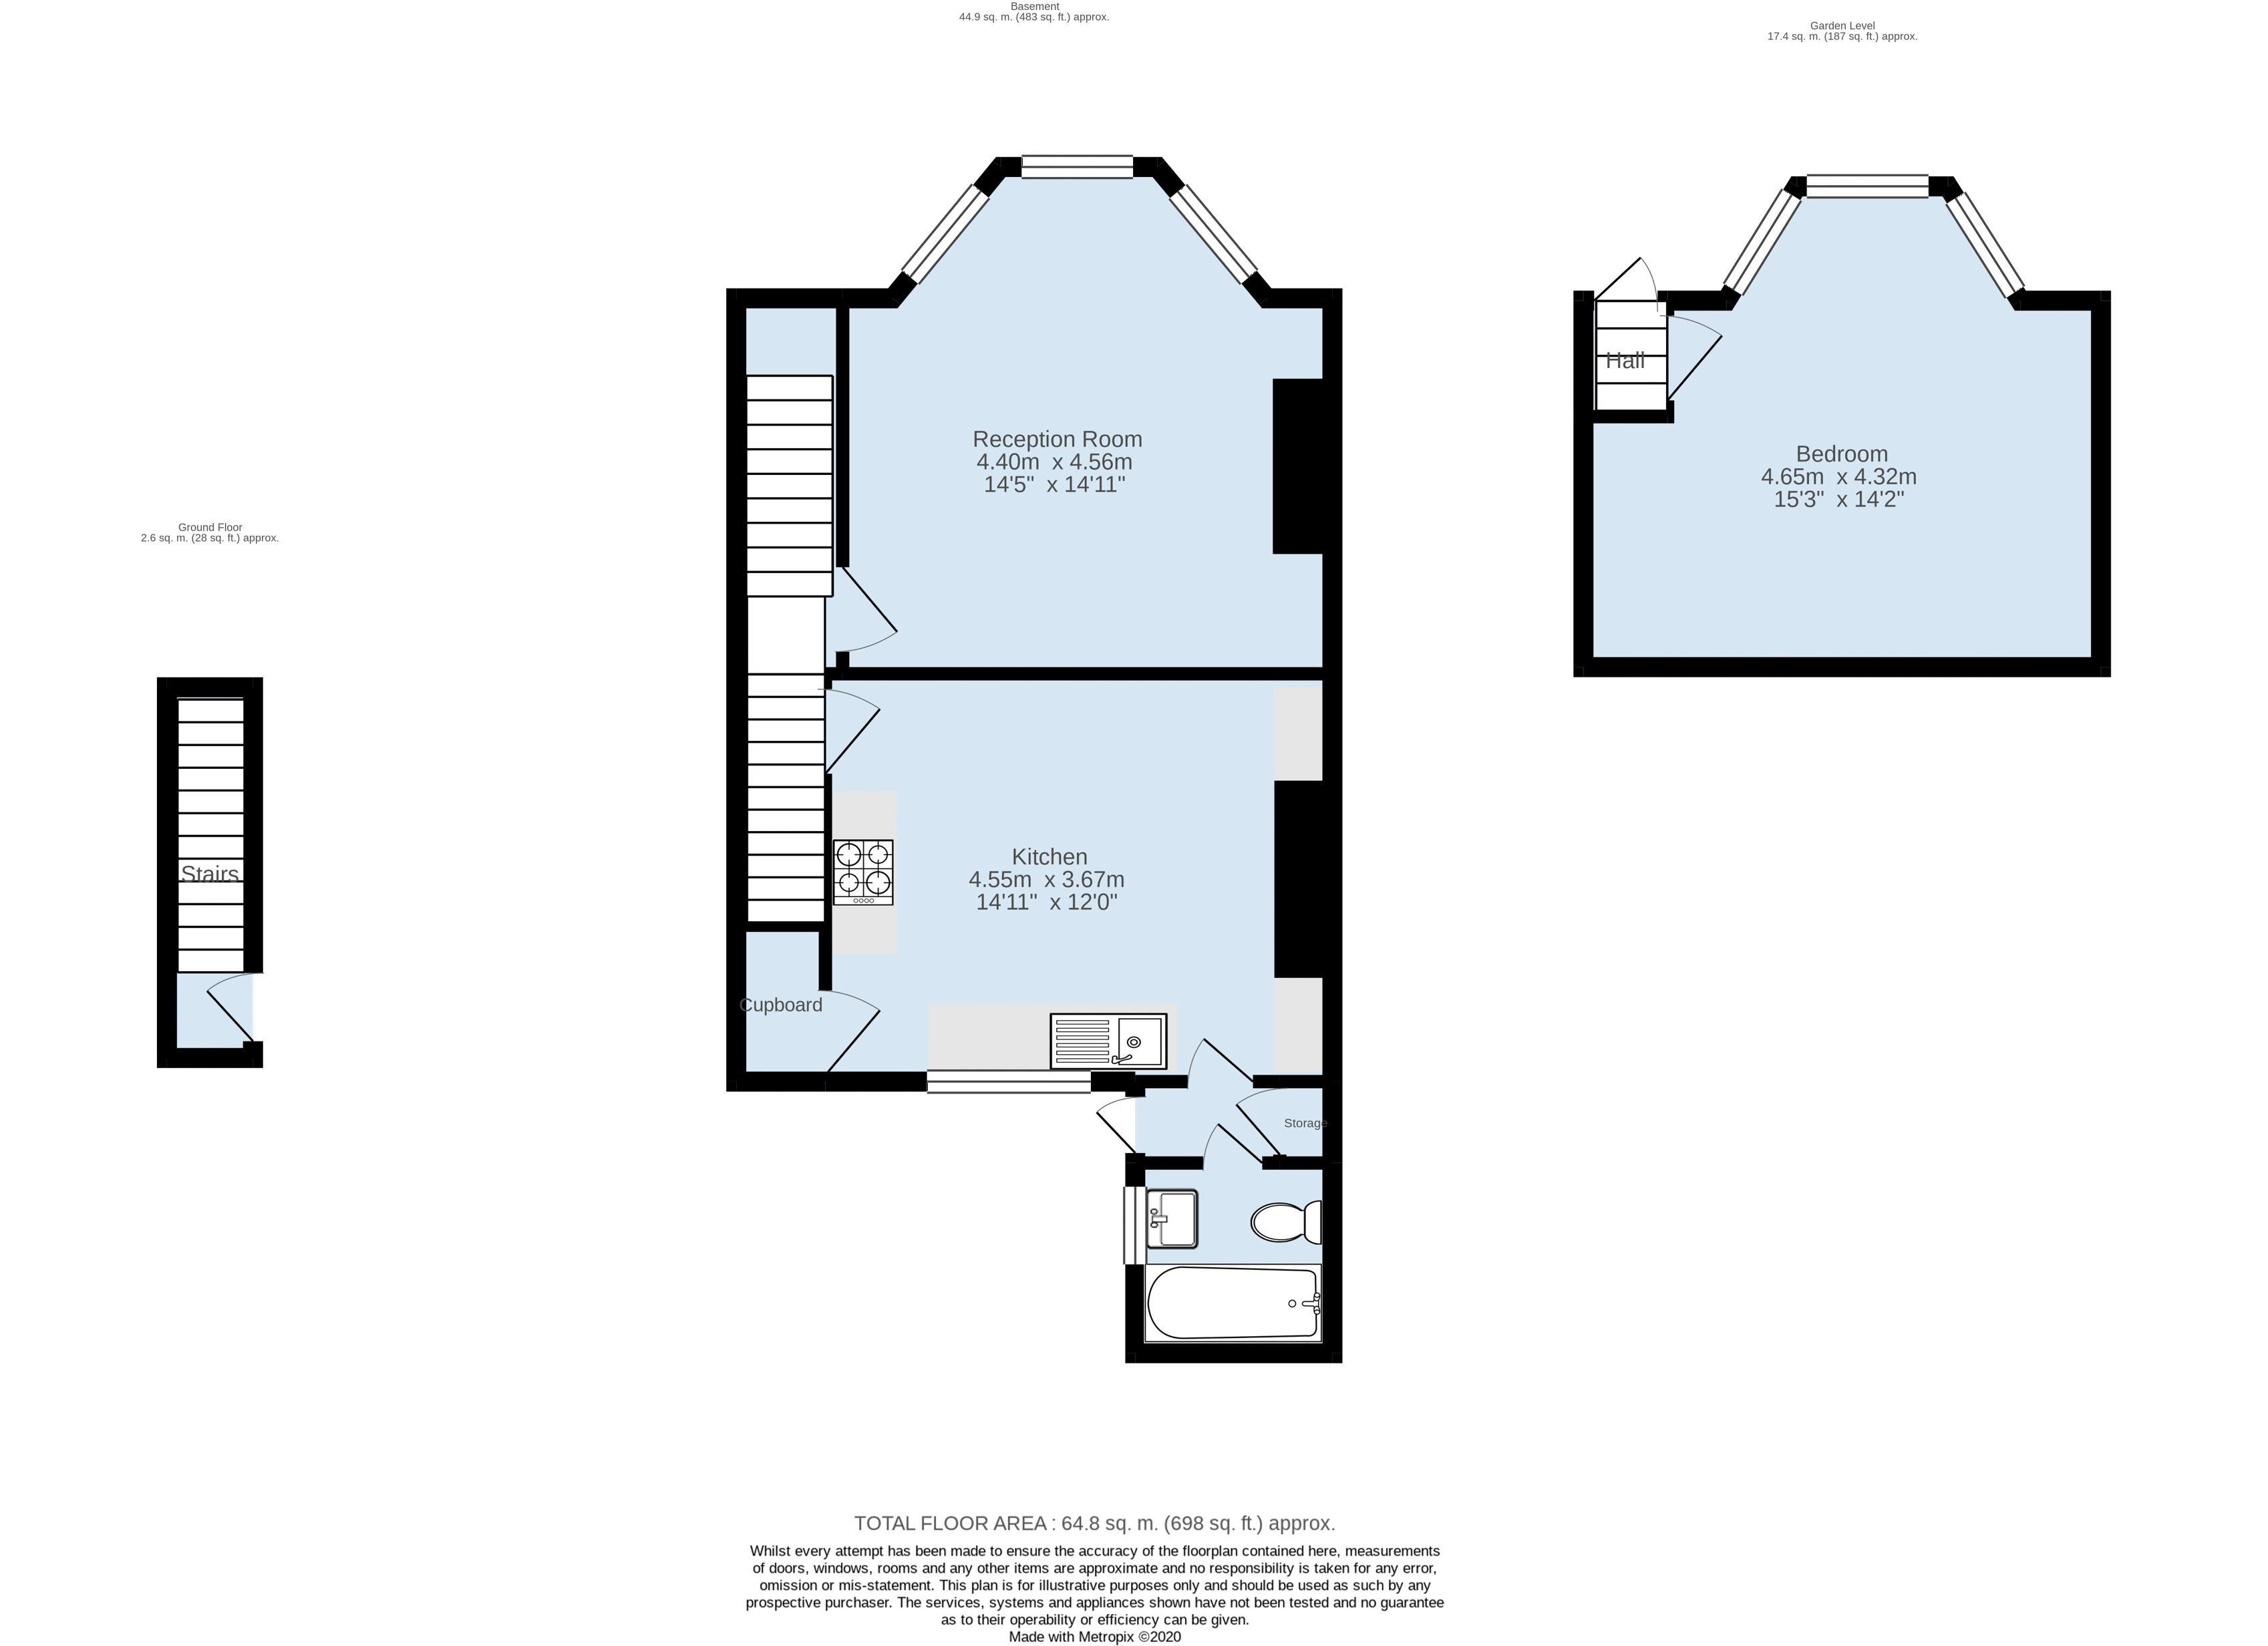 27BC-F1 - Floorplan